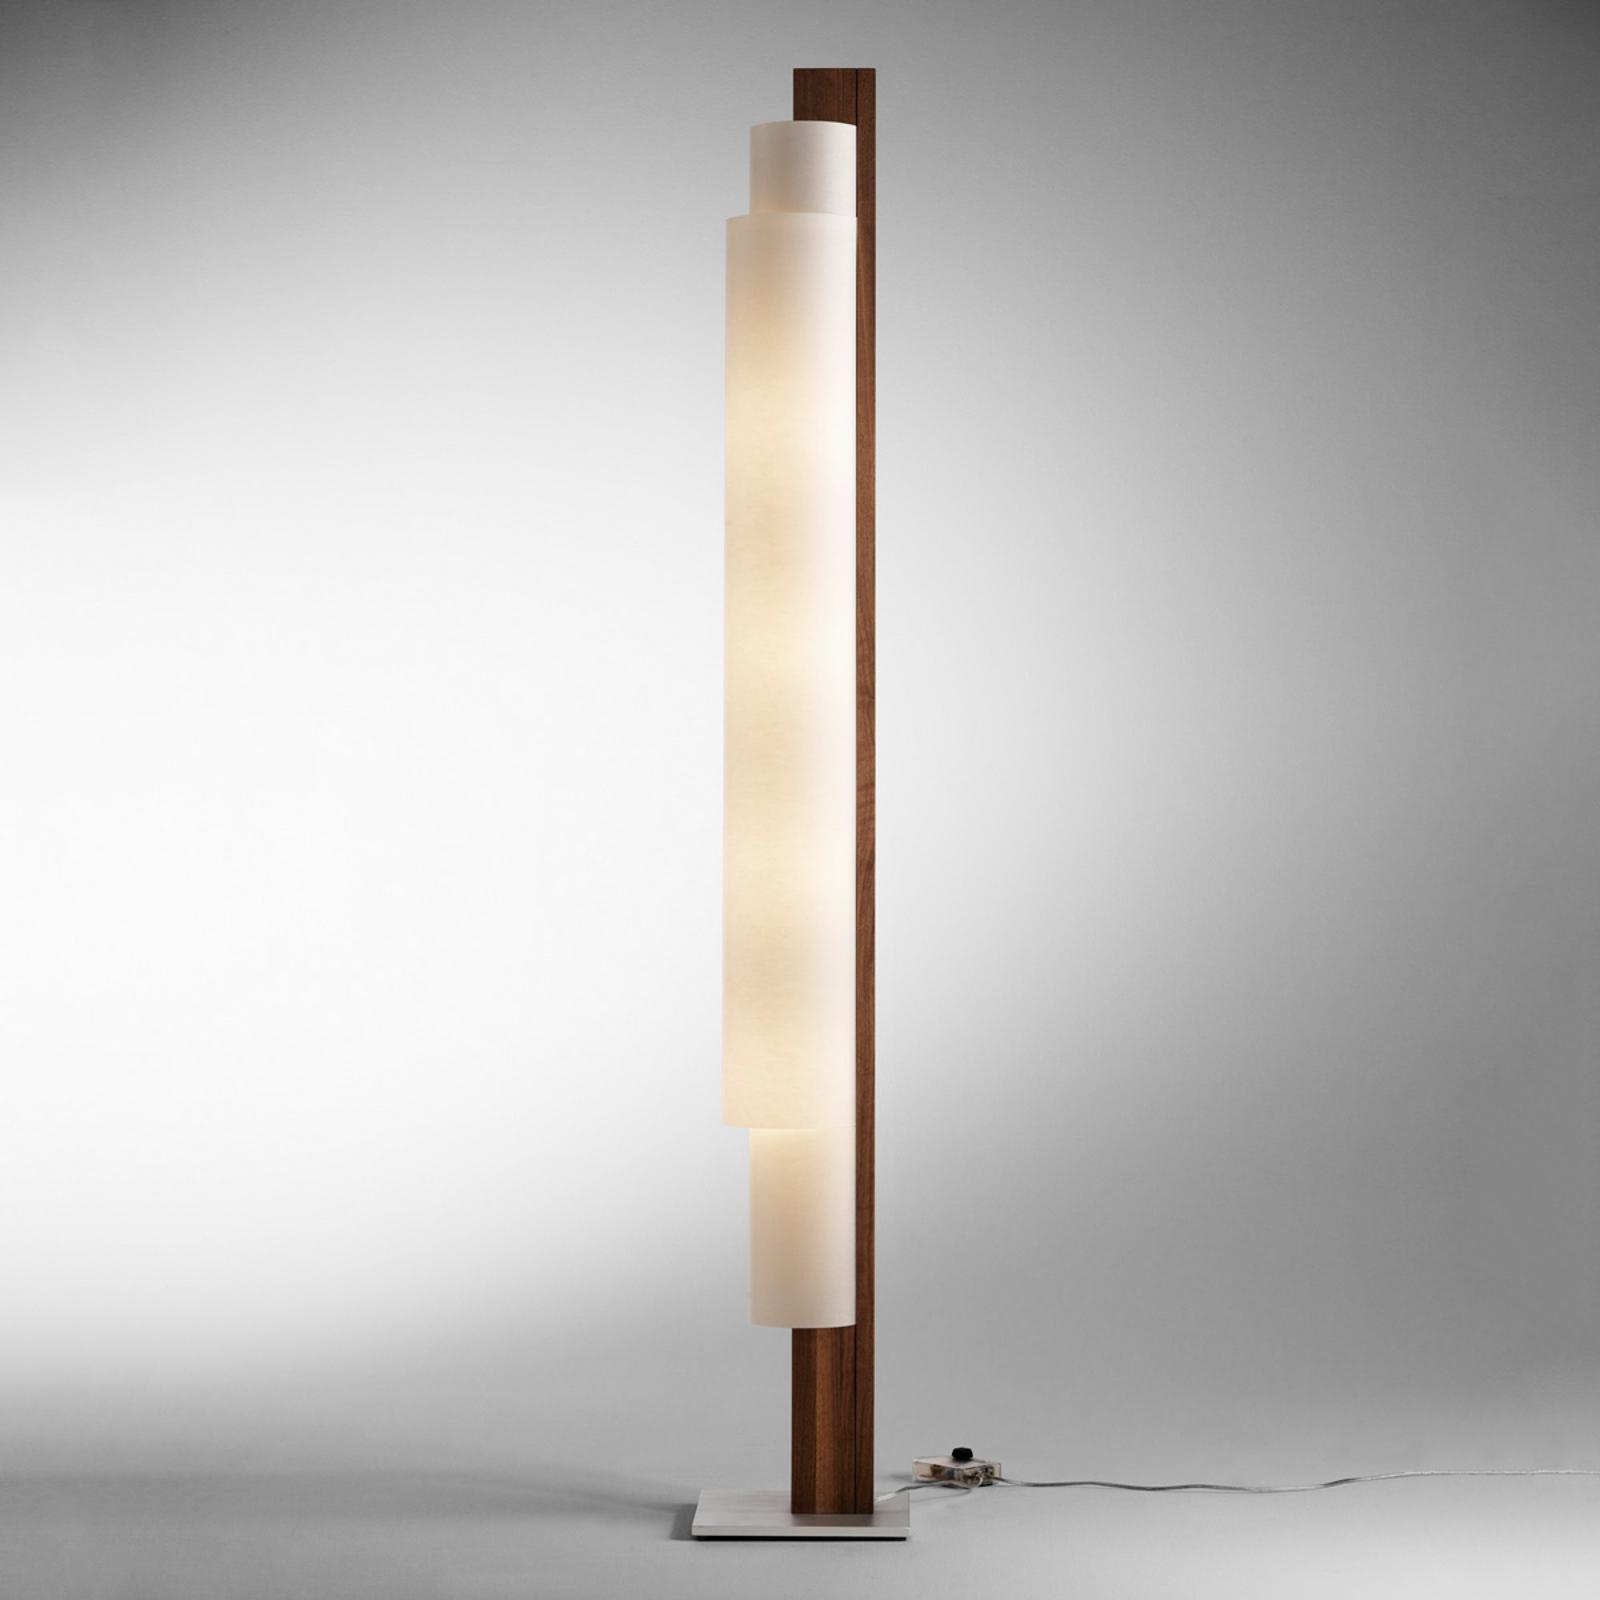 LED-gulvlampe Stele nøttetre